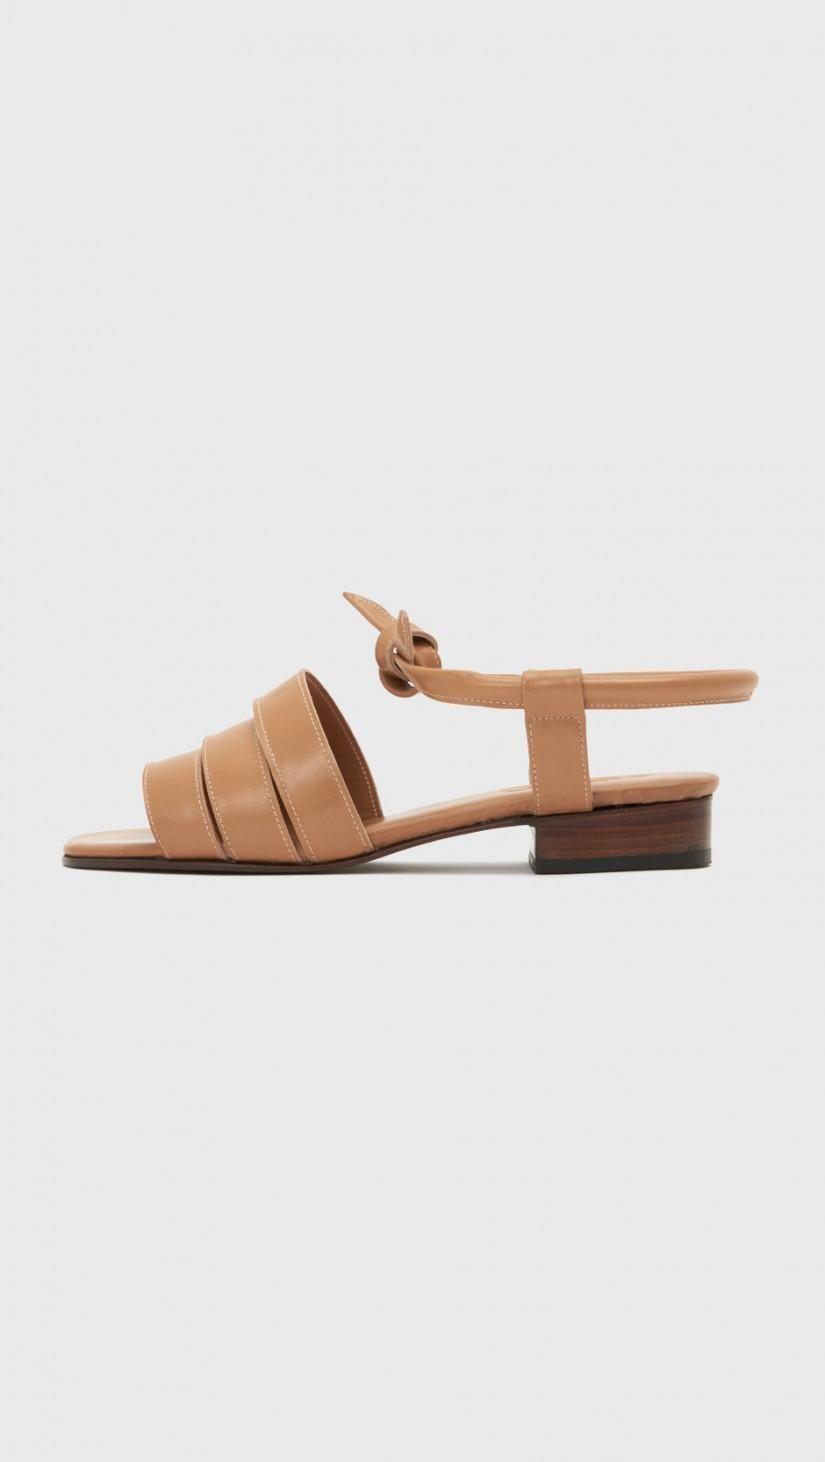 b1193dc9eb40b Martiniano Mahuta Tie Sandal in Hermes | The Dreslyn | MARTINIANO ...